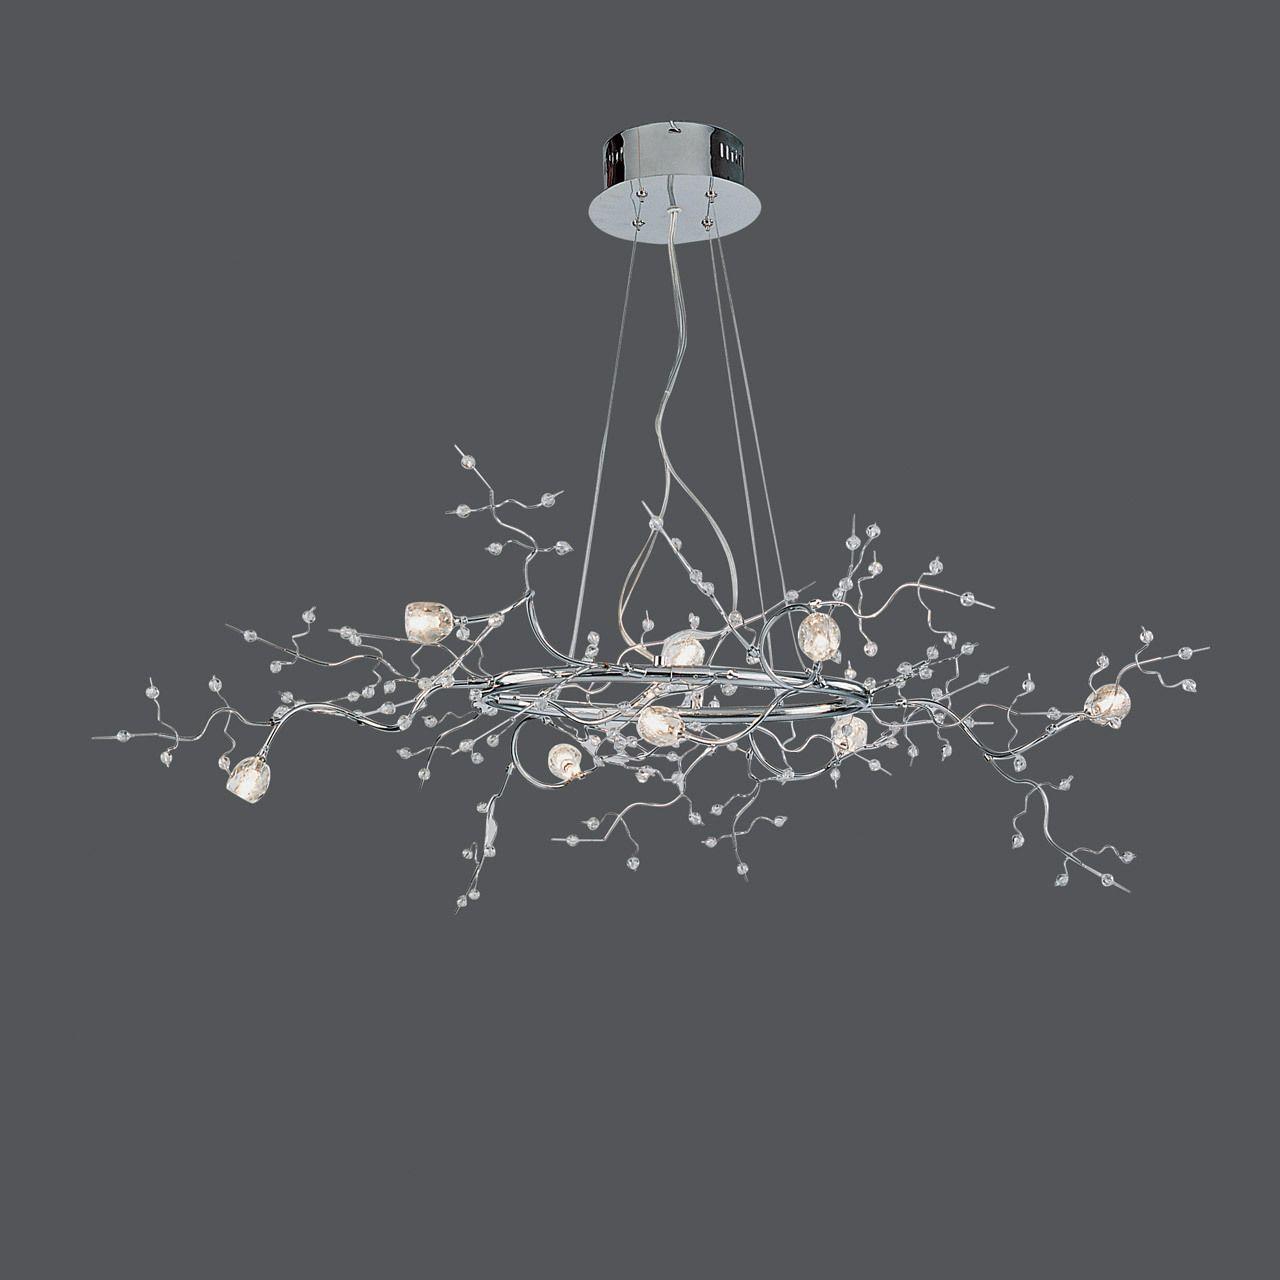 Modern lighting ceiling lights chandeliers winterfell twigs modern lighting ceiling lights chandeliers winterfell twigs with blossoms crystal mozeypictures Images